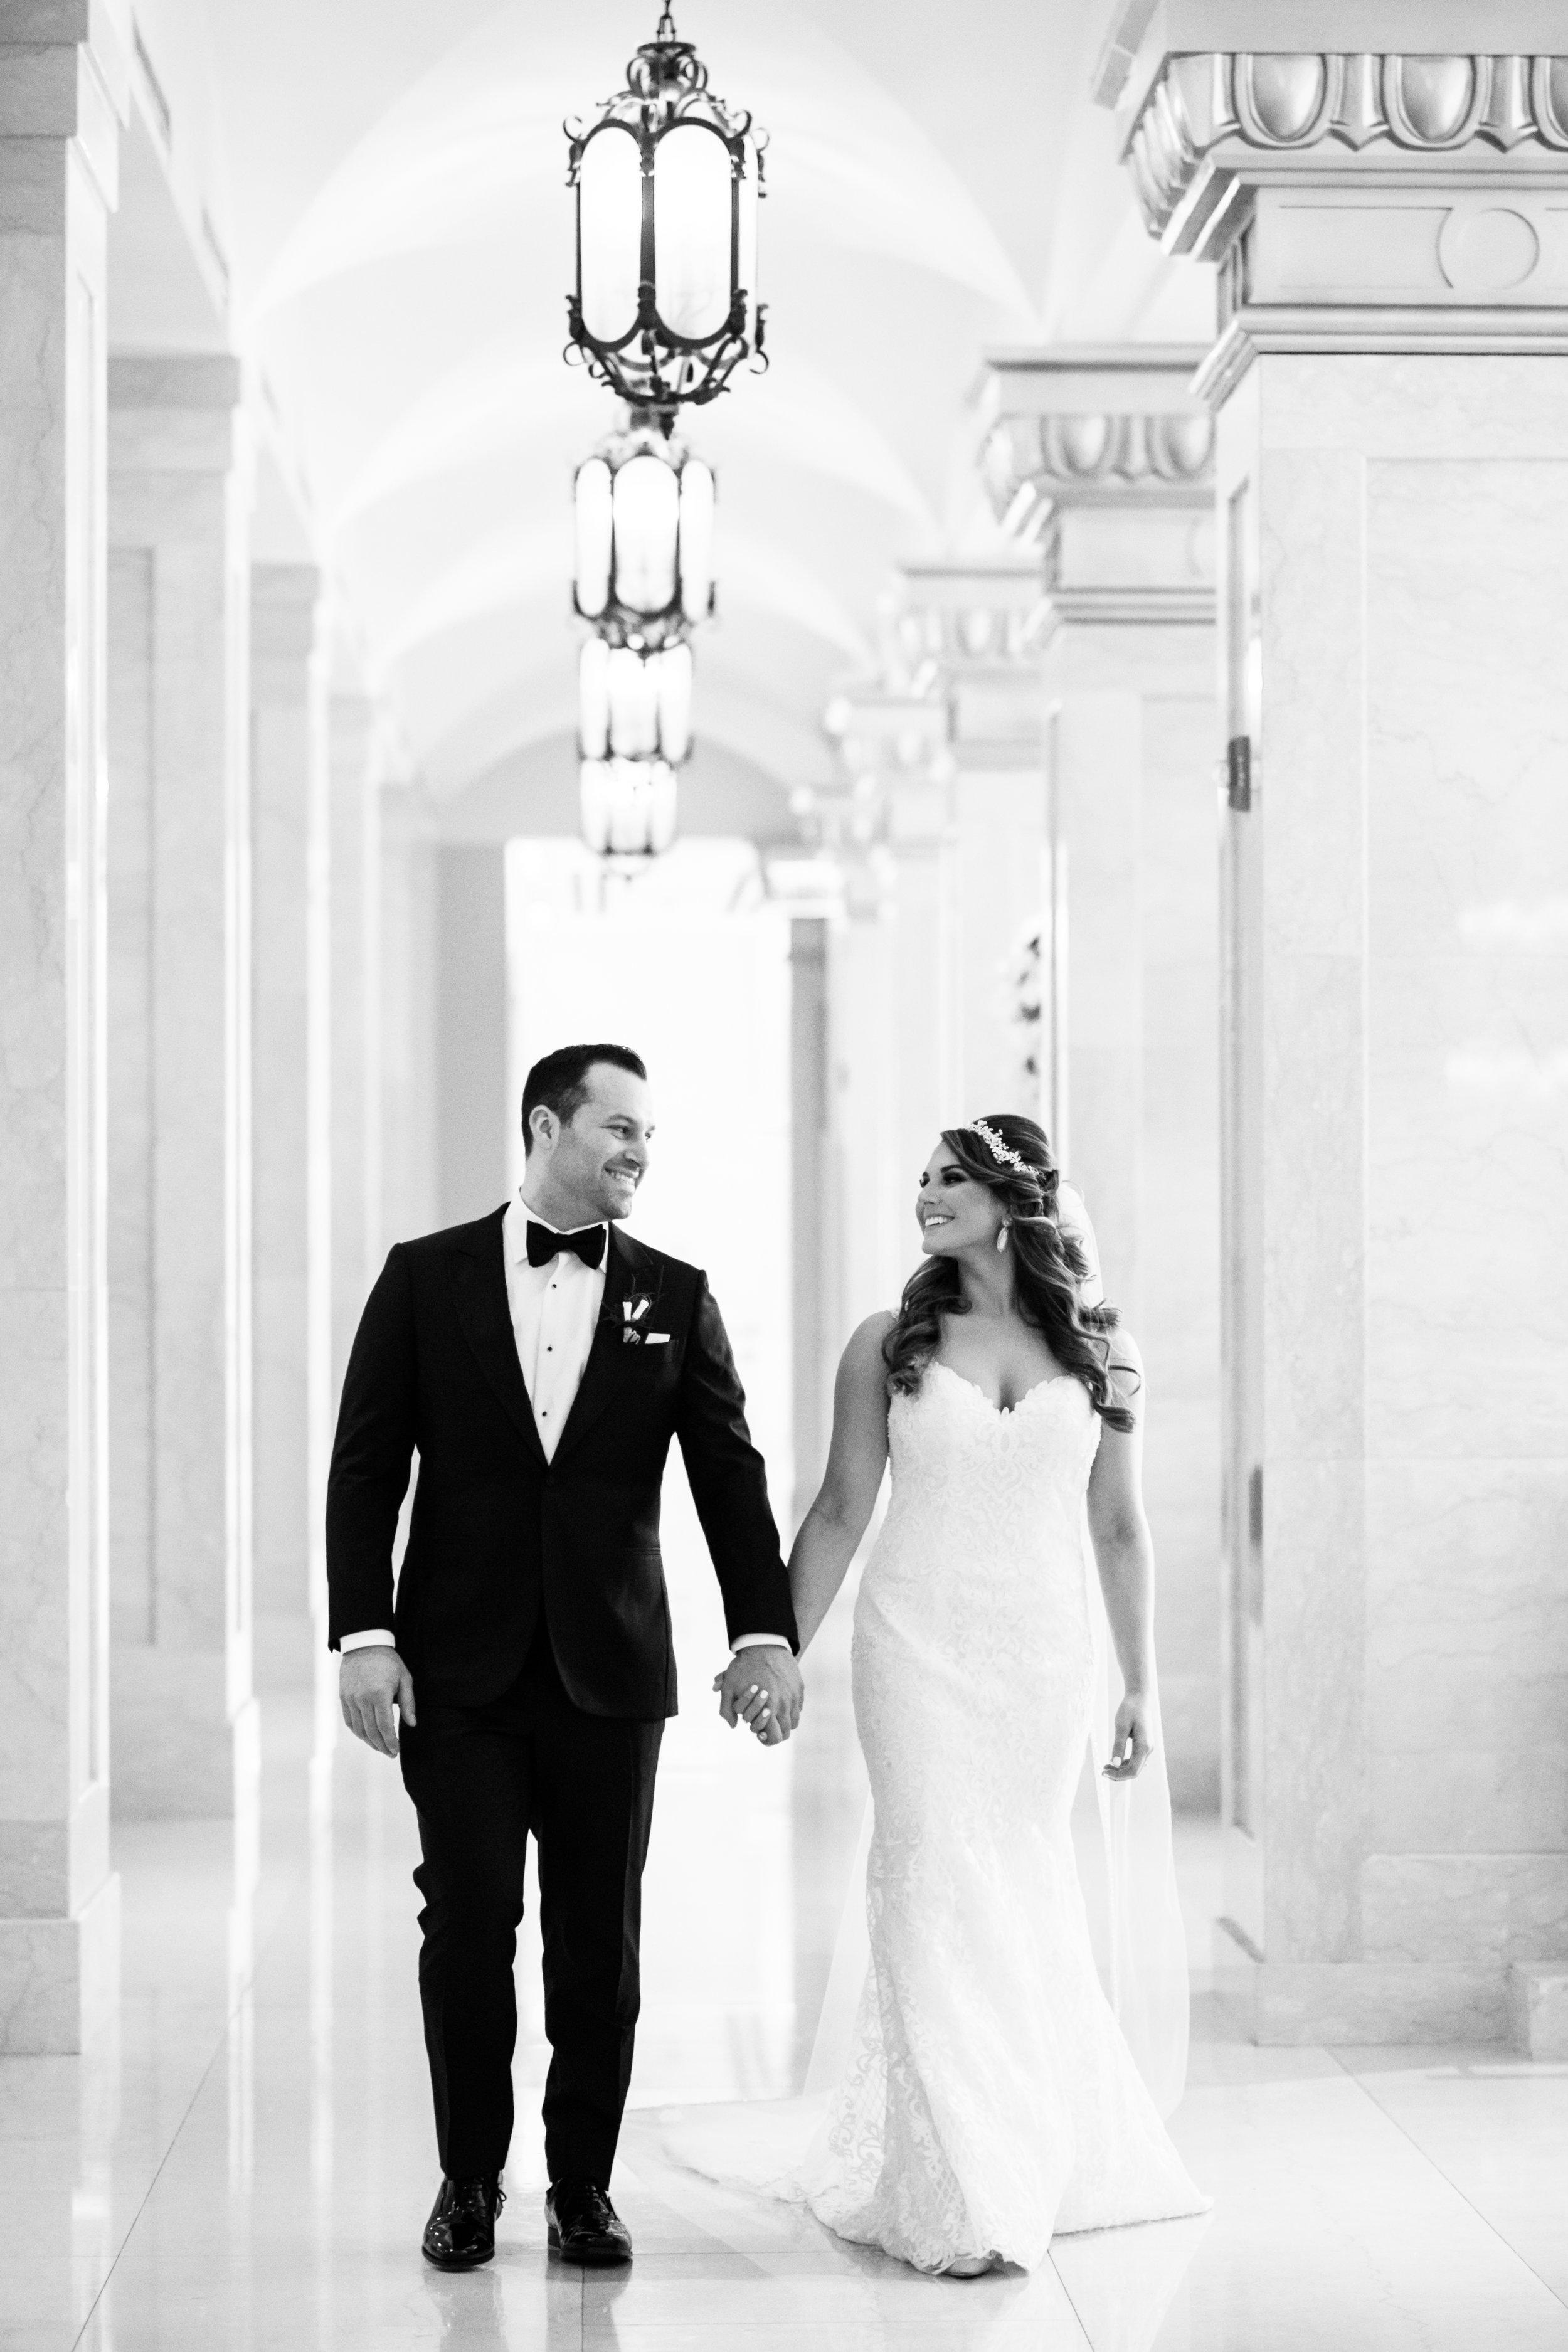 Elegant wedding at the JW Marriott Chicago6.jpg